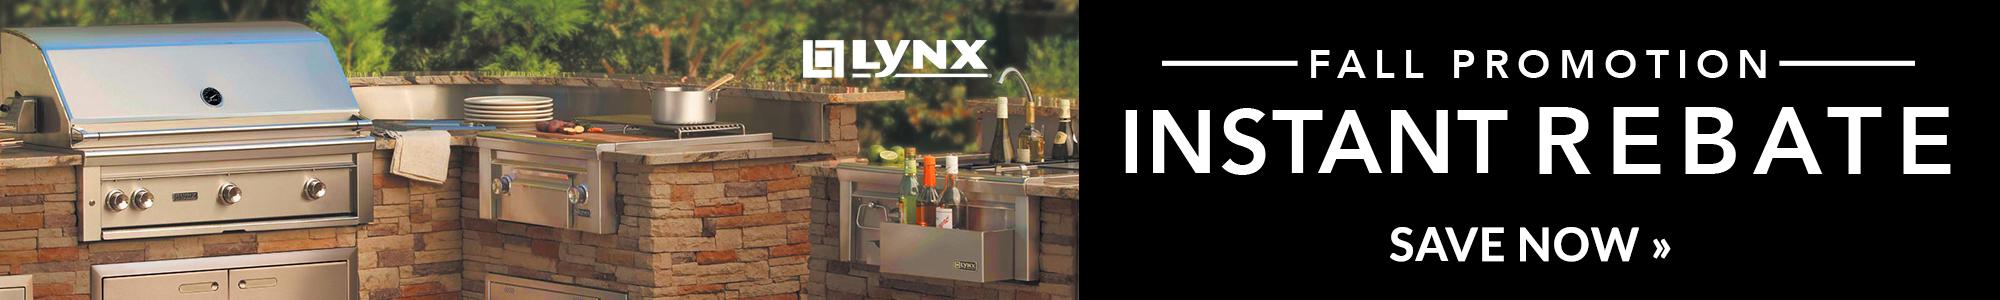 Lynx Fall Promo